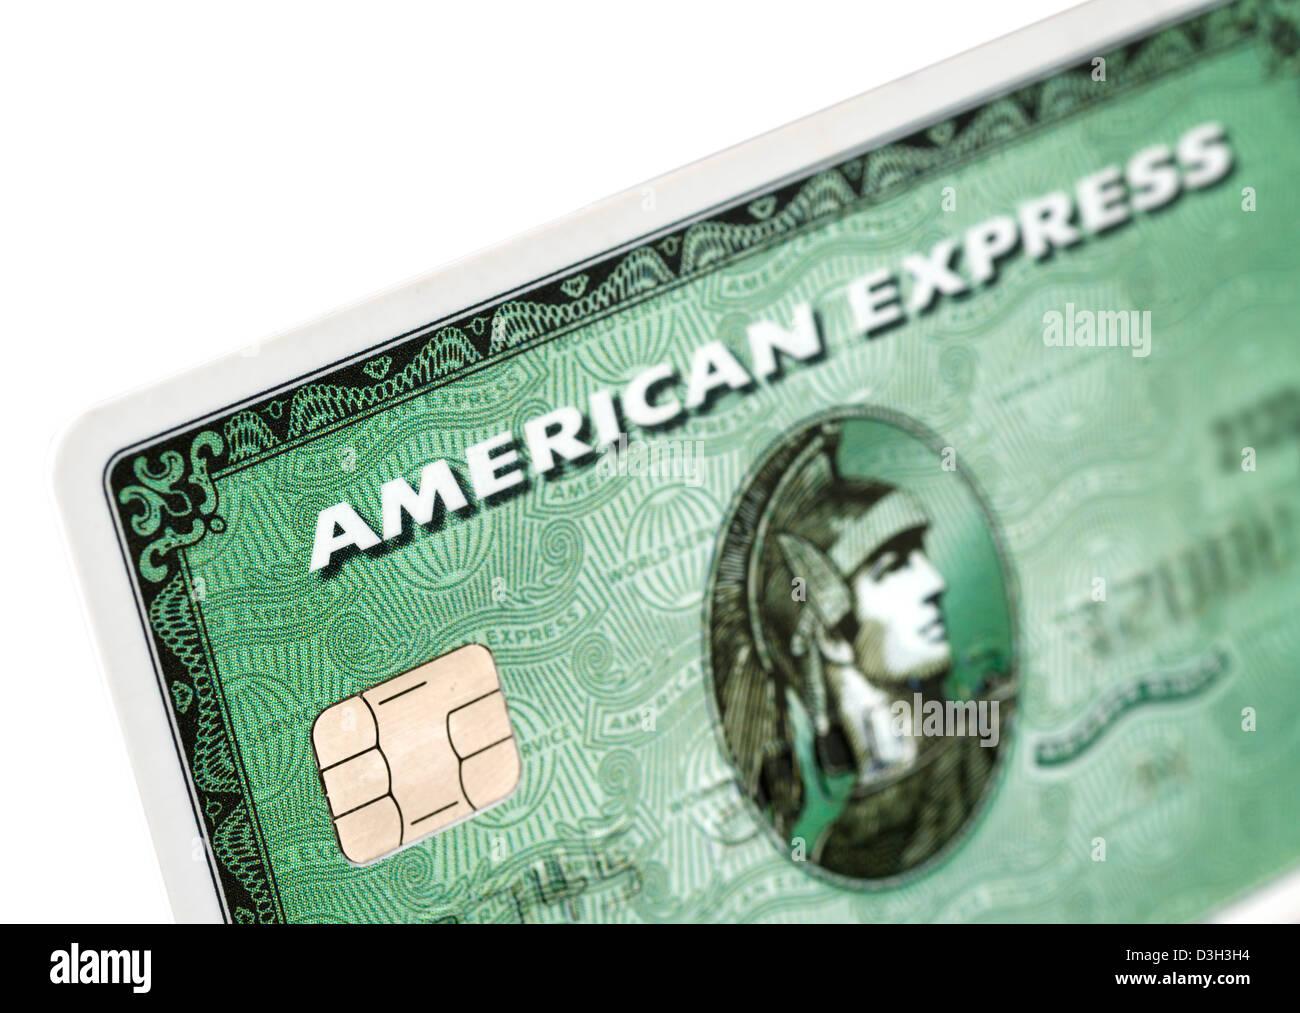 American Express Tarjeta verde de carga clásico Imagen De Stock